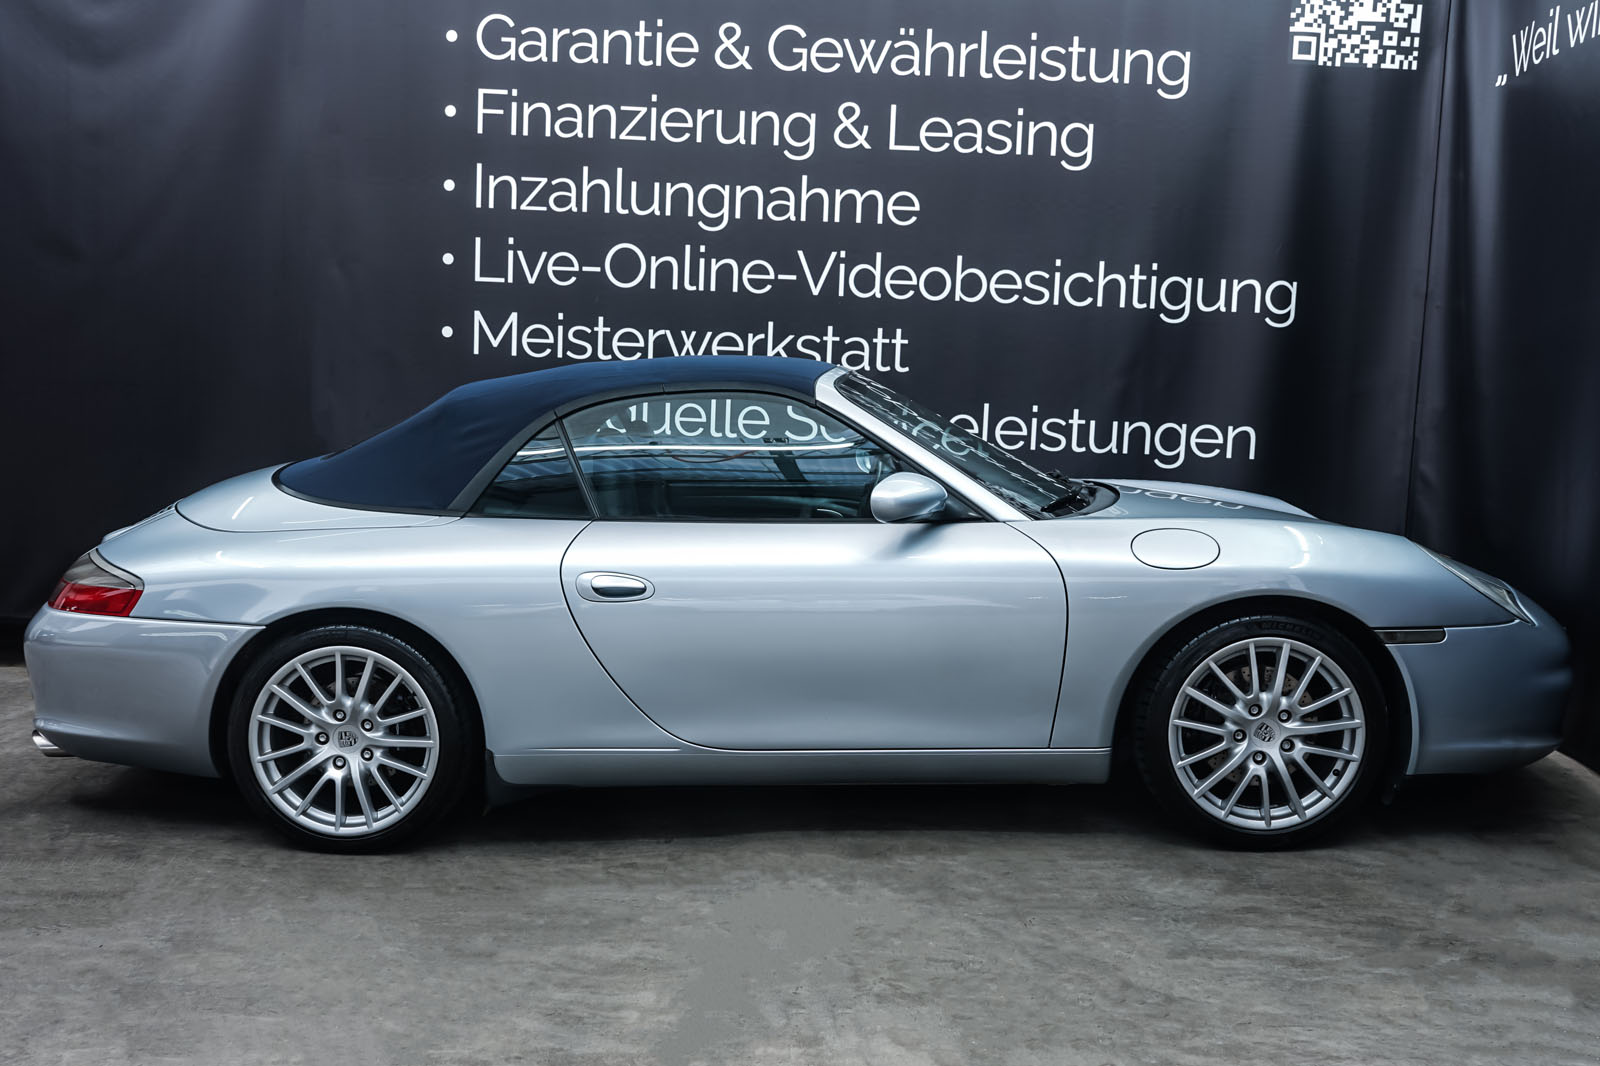 Porsche_996_Cabrio_Silber_Dunkelblau_POR-1724_19_w